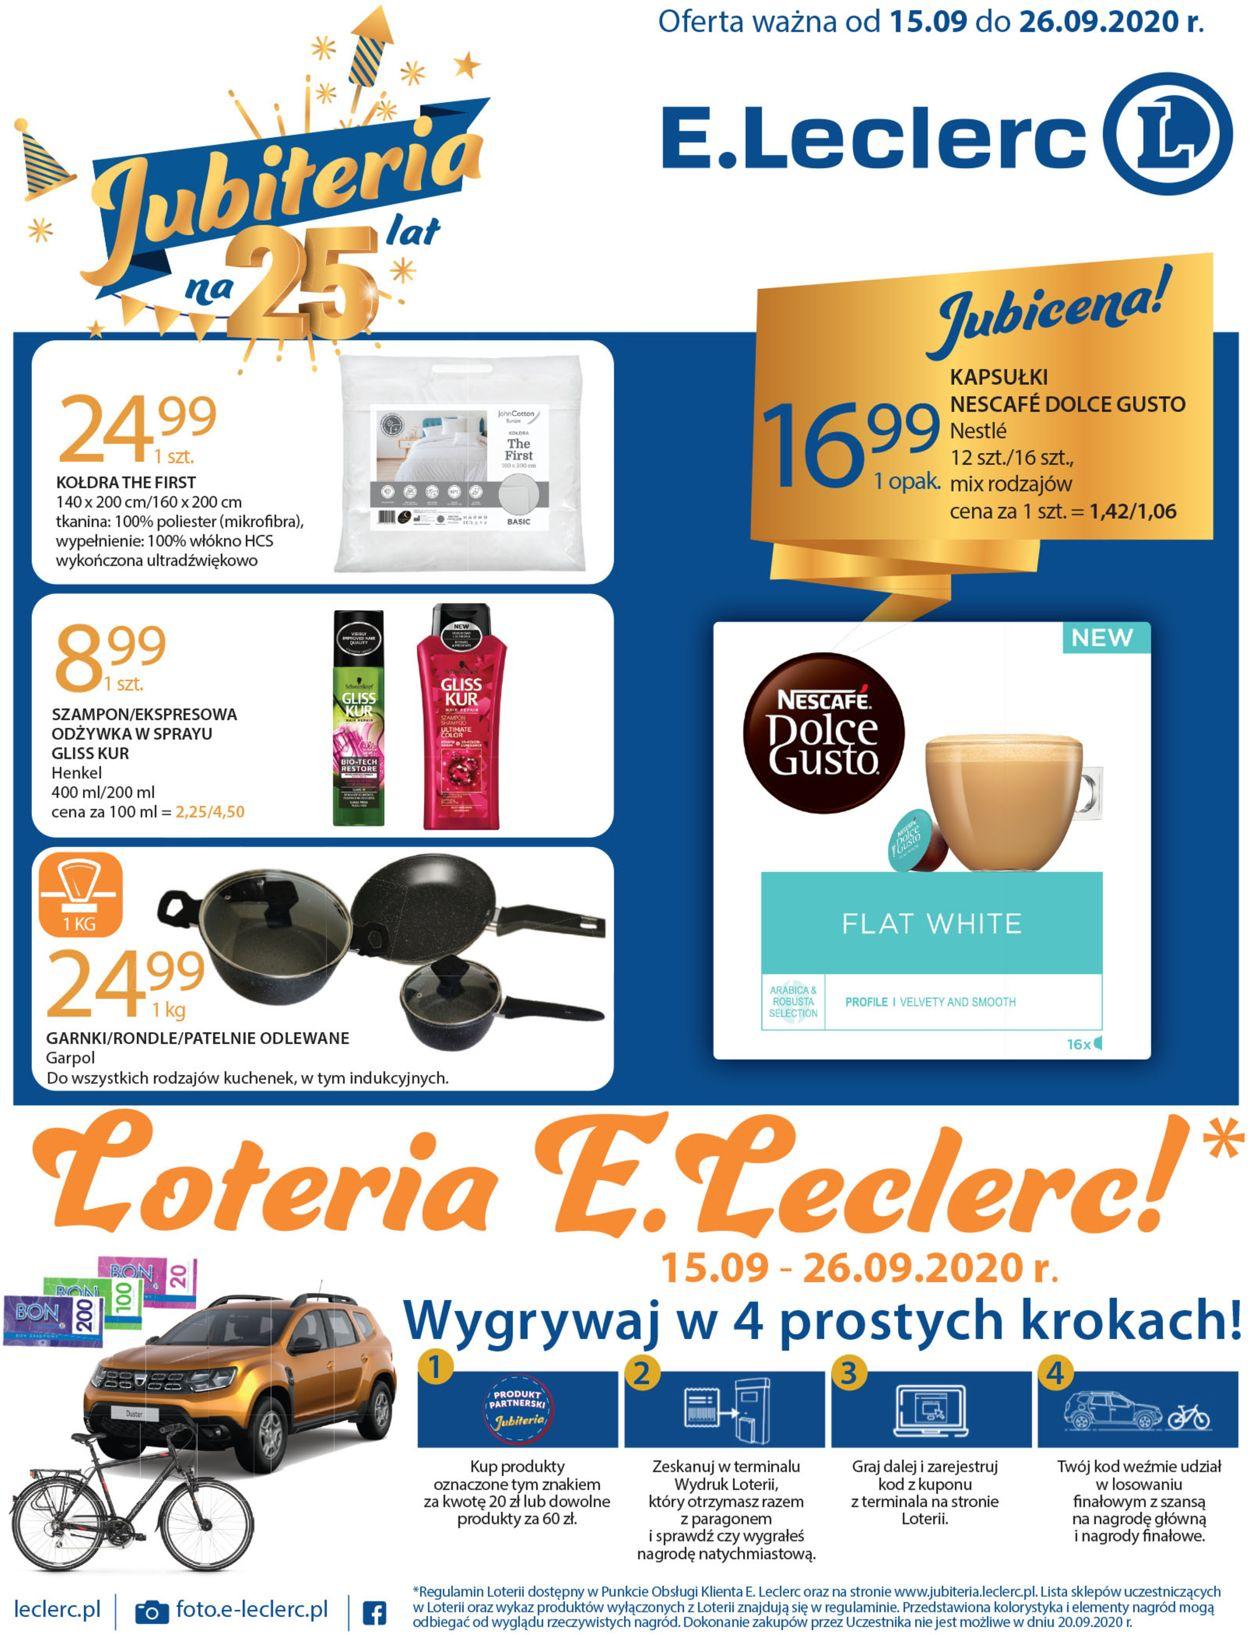 Gazetka promocyjna E.Leclerc - 15.09-26.09.2020